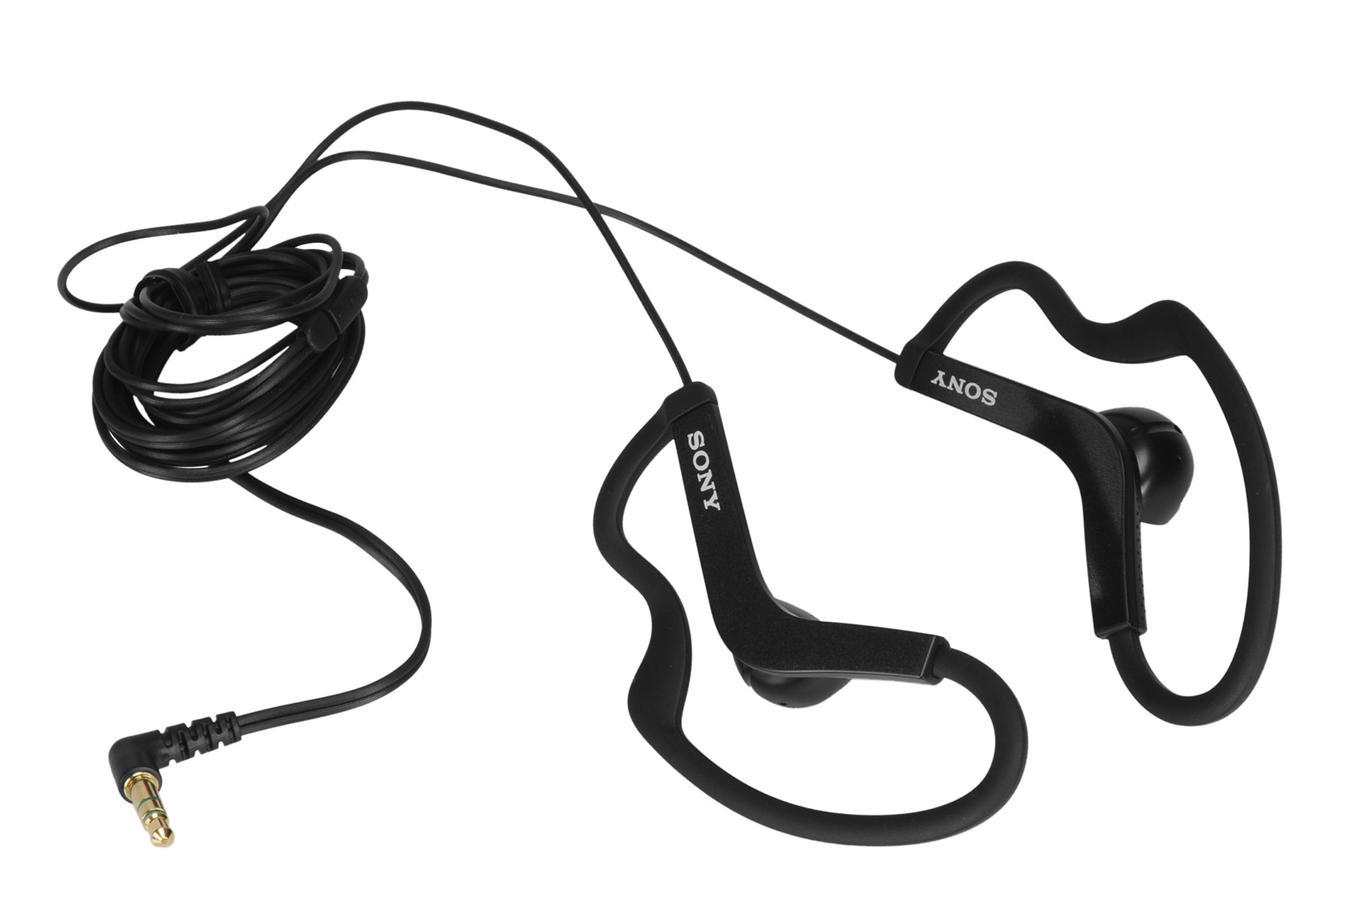 casque intra auriculaire sony mdr as200 sport noir. Black Bedroom Furniture Sets. Home Design Ideas